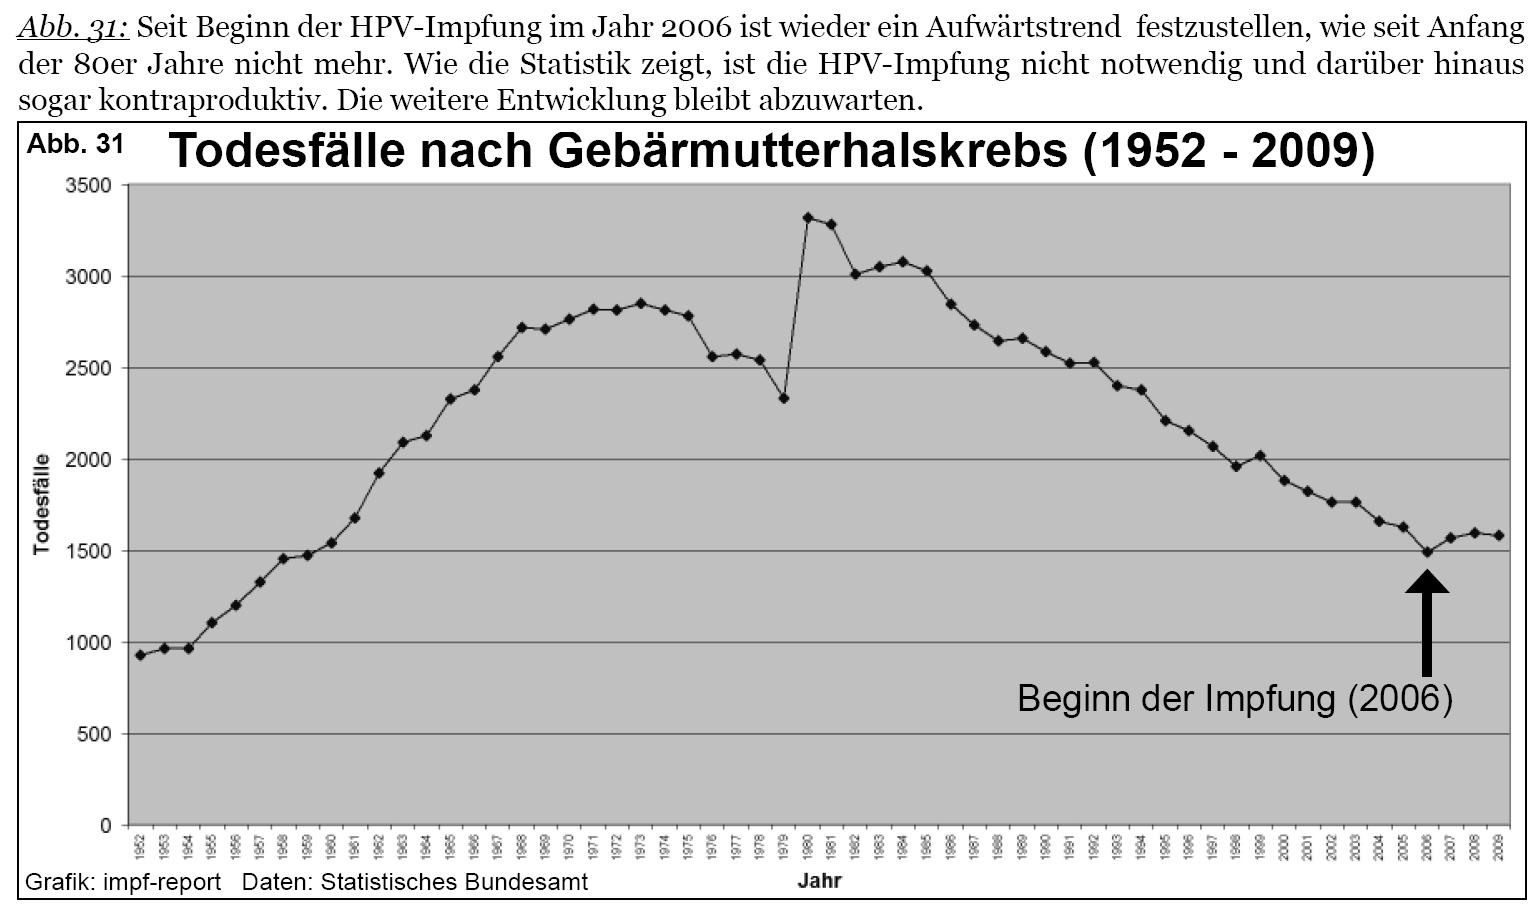 papilloma impfung nebenwirkungen